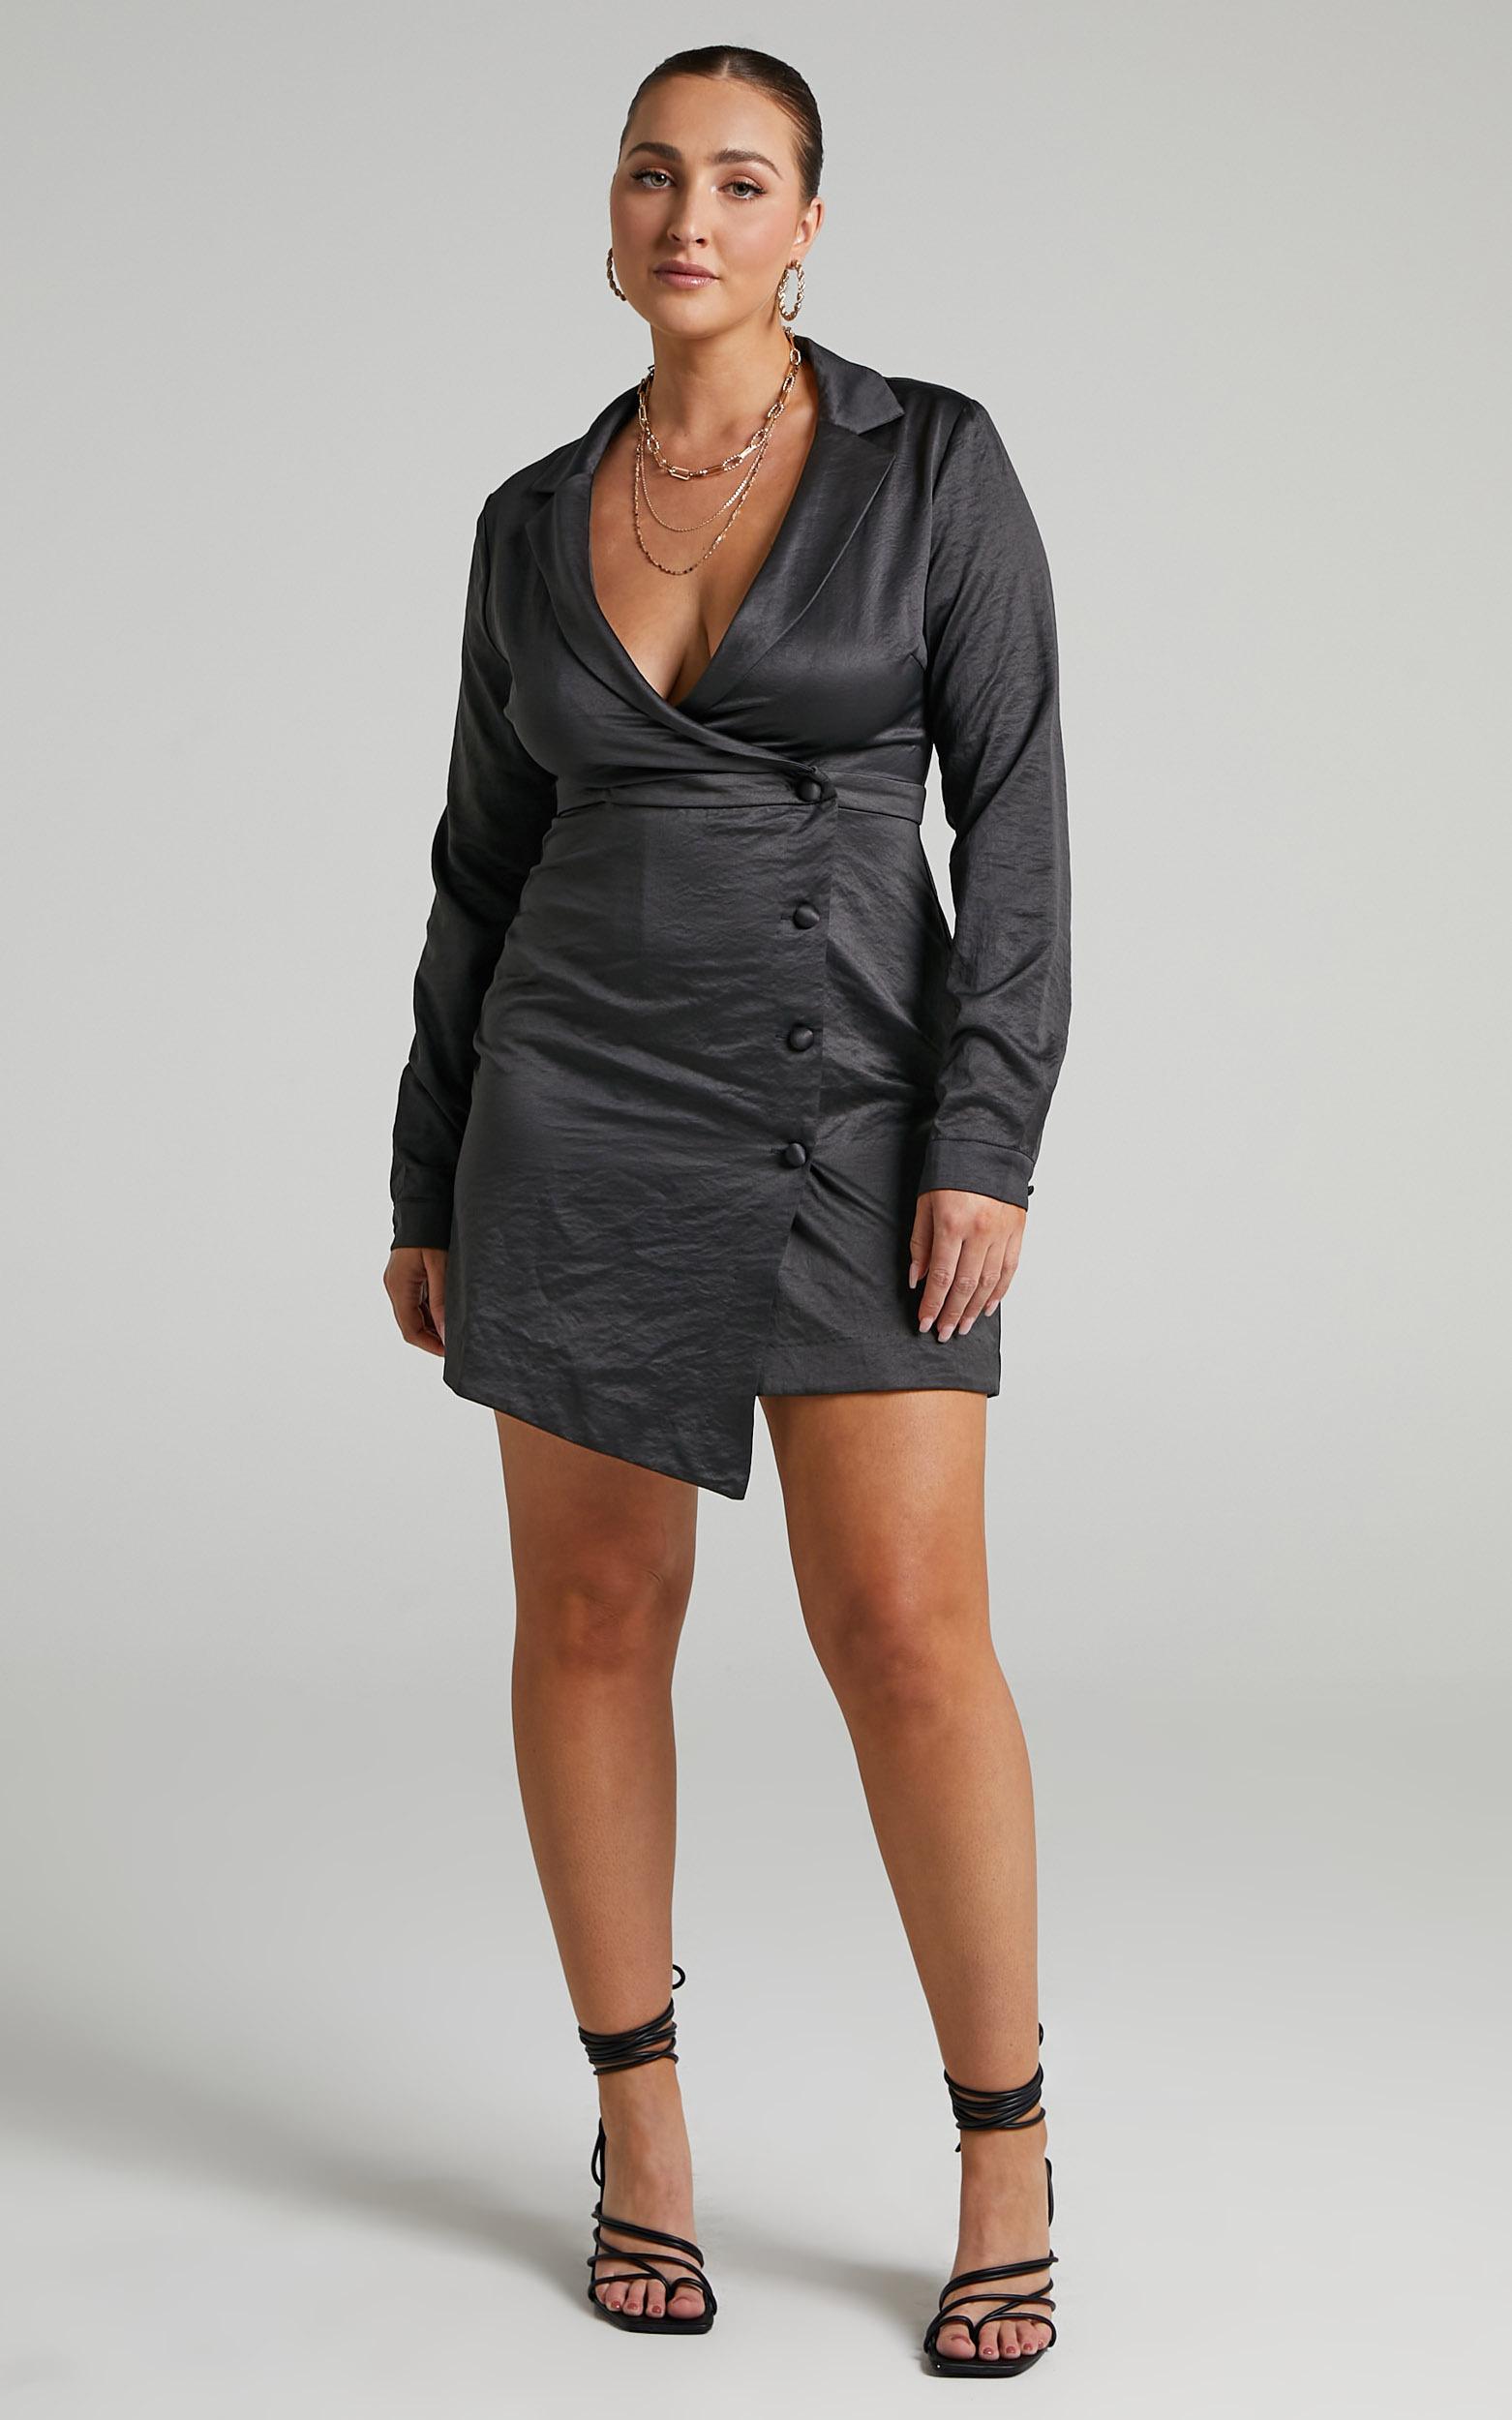 Nevie Wrap Style Blazer Dress in Black - 04, BLK1, hi-res image number null